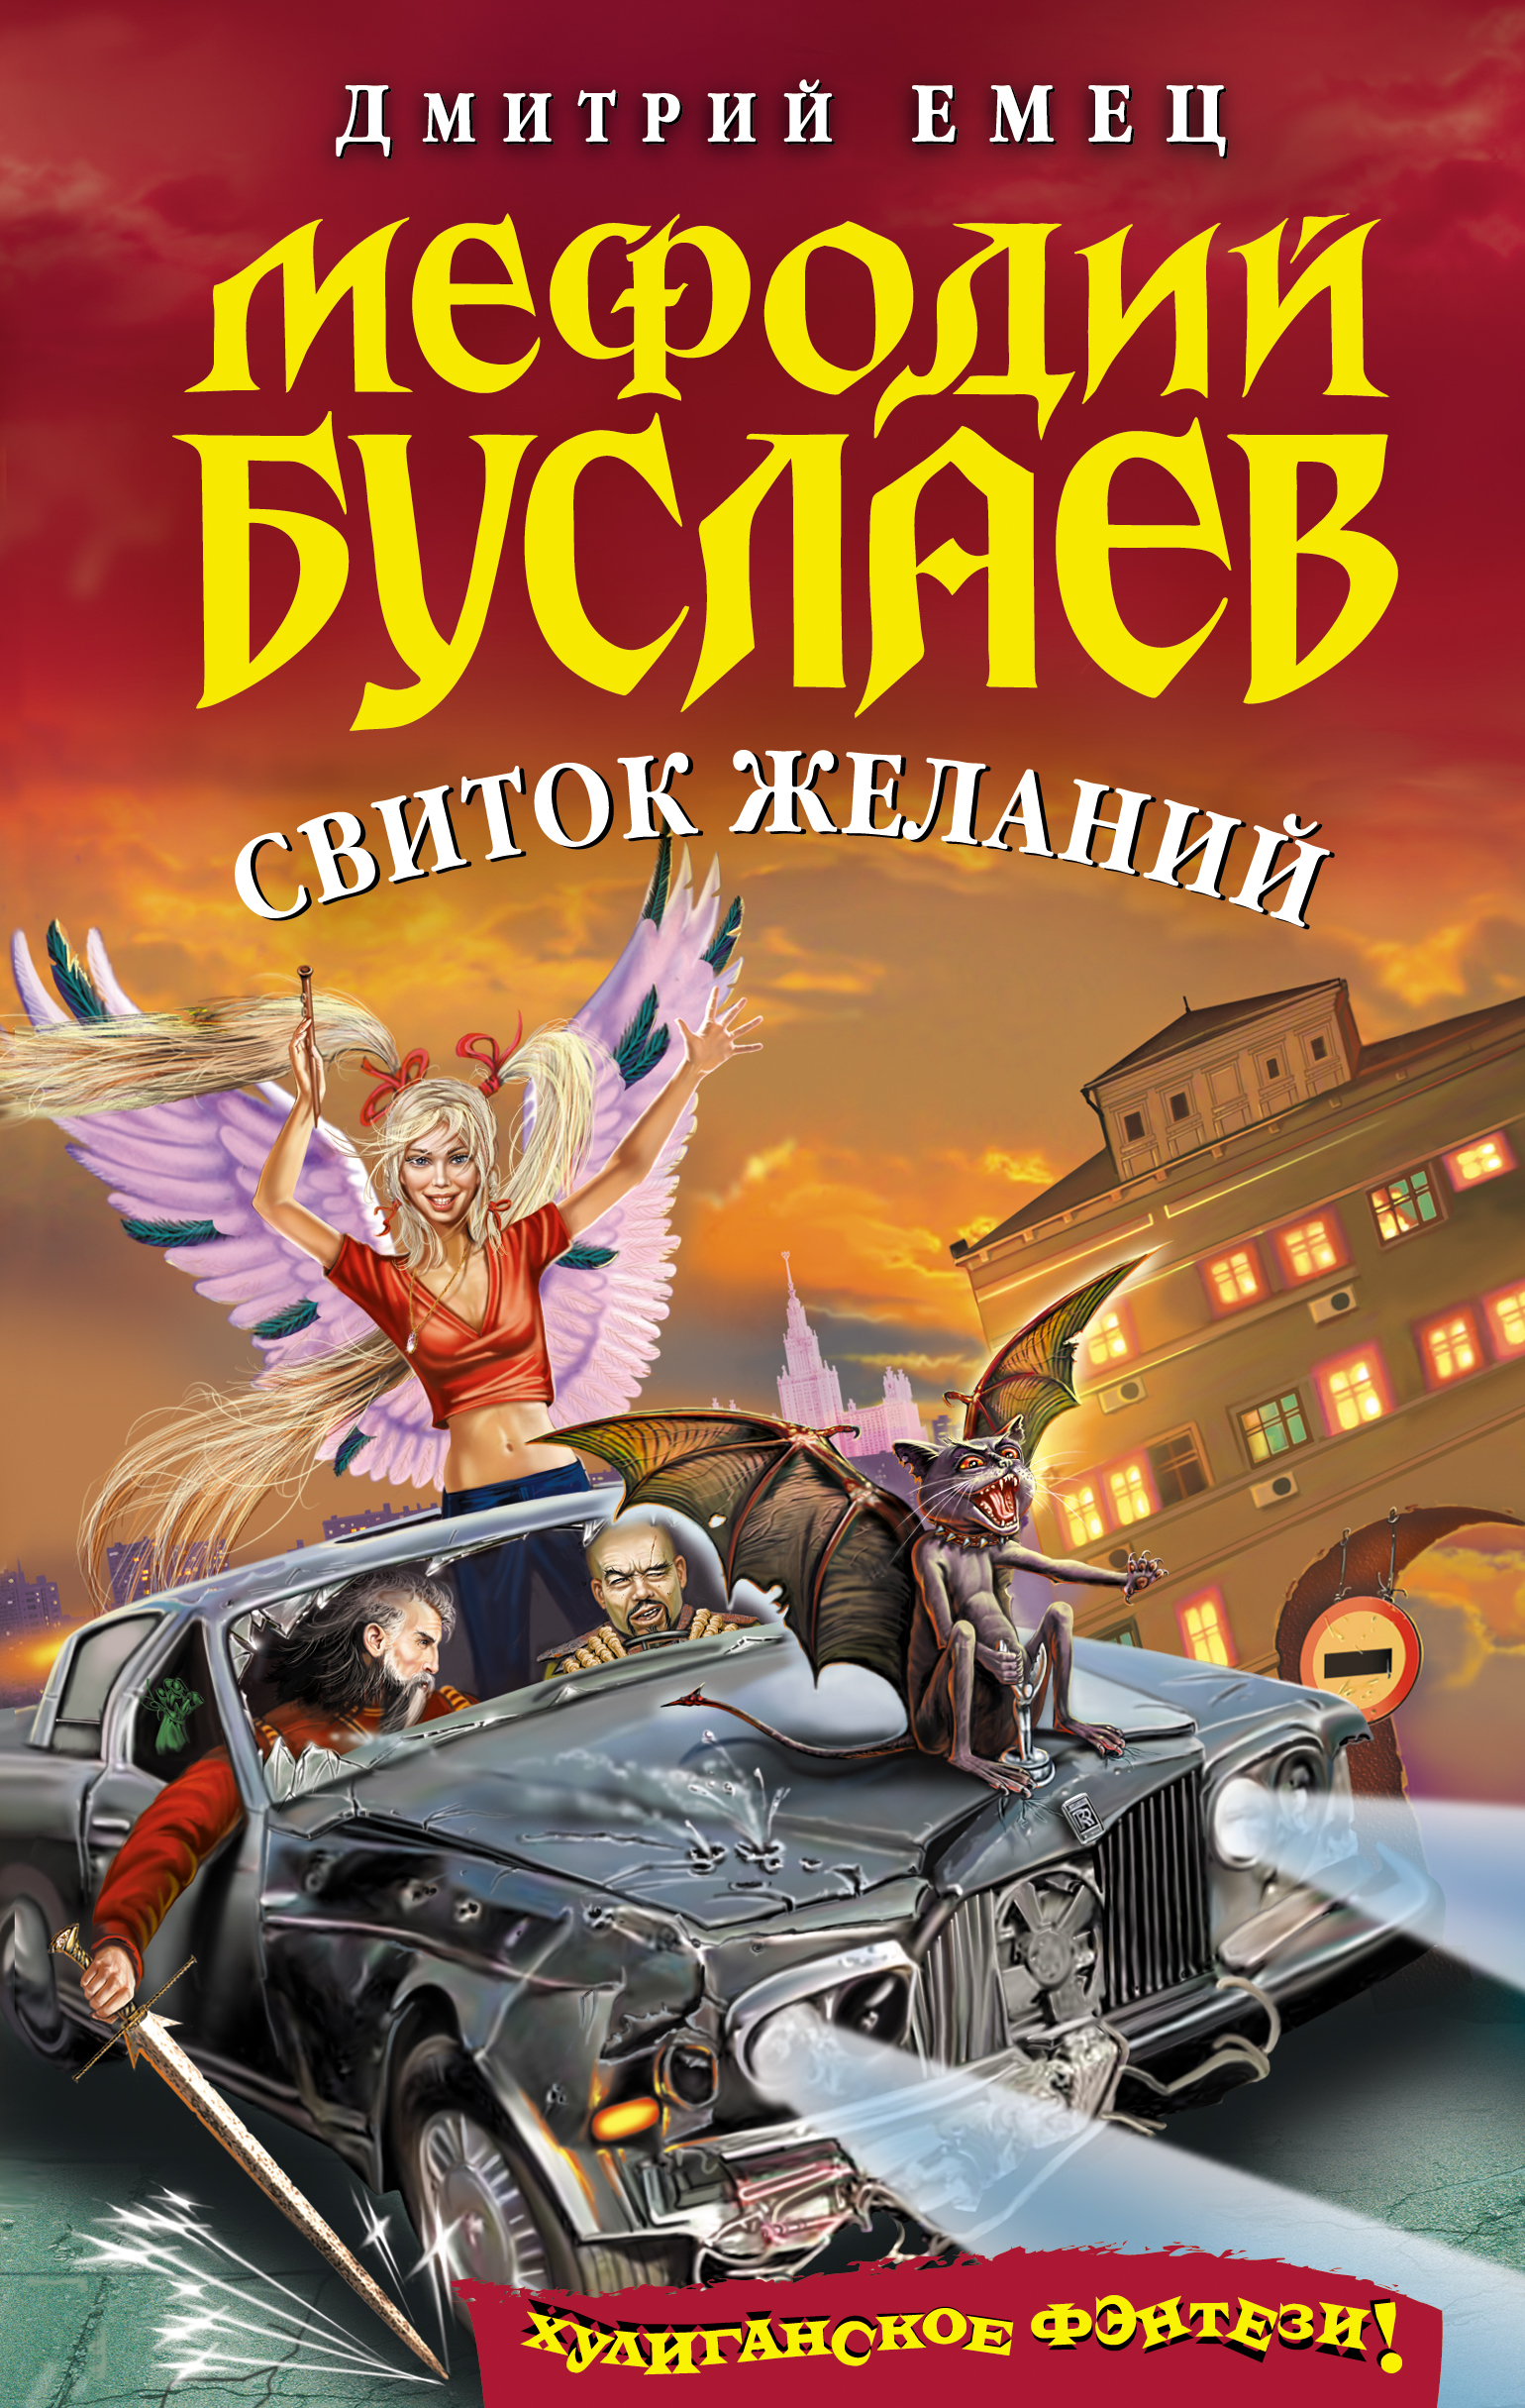 Дмитрий Емец Свиток желаний цены